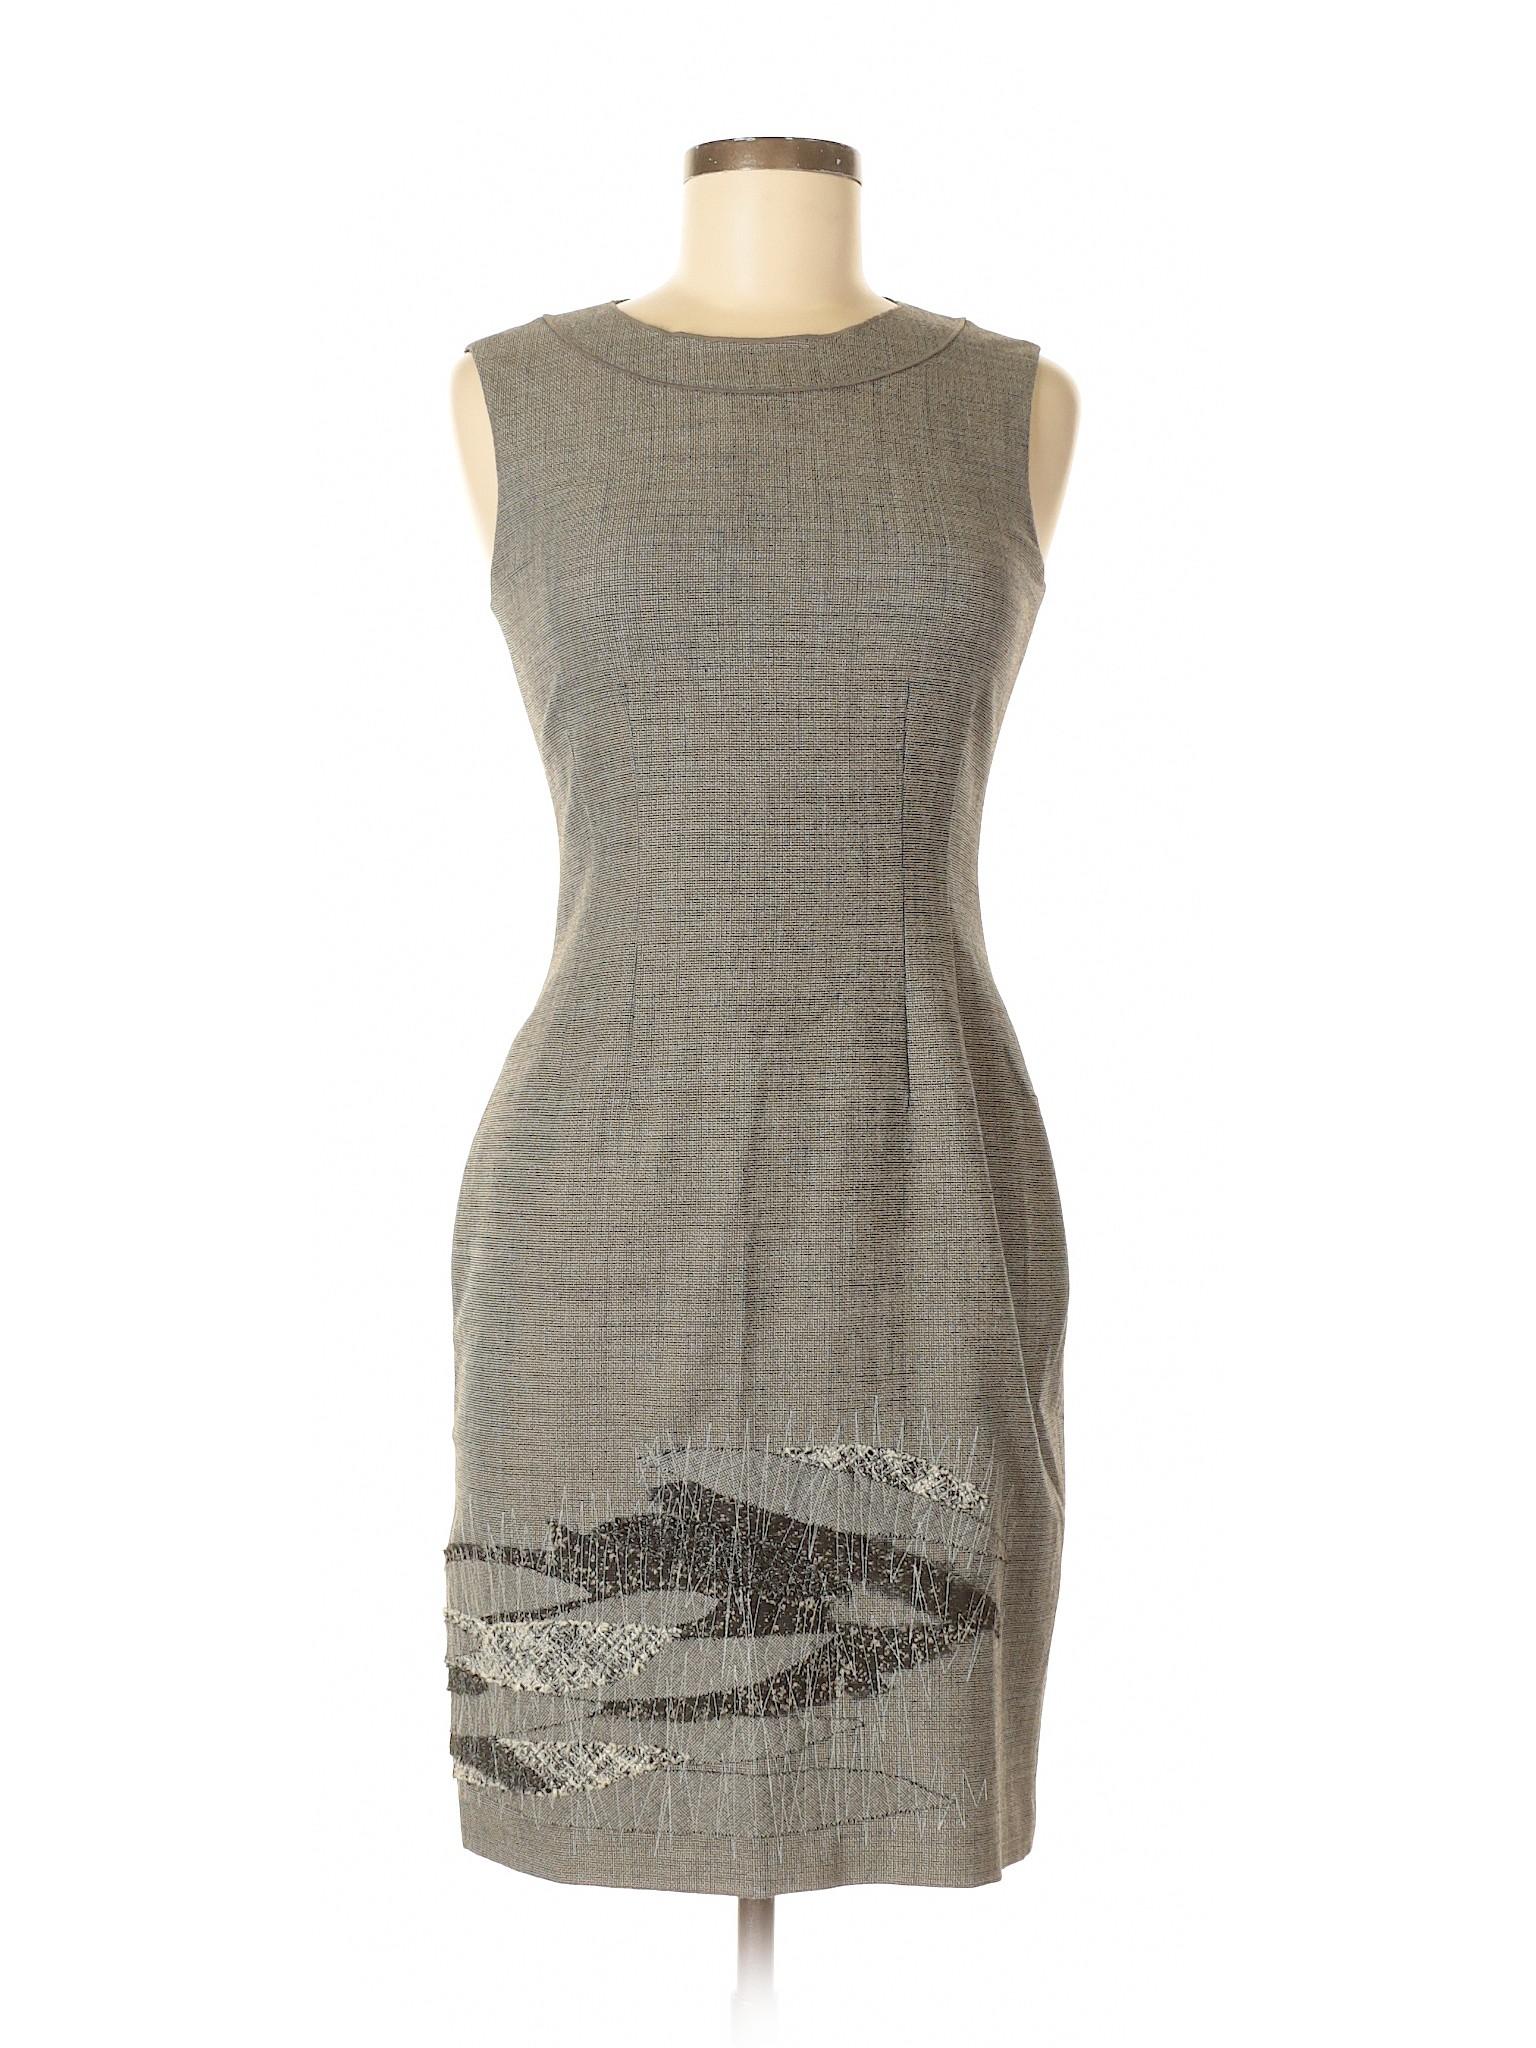 Selling Selling Elie Tahari Dress Elie Tahari Casual Casual Dress wxUOzqx7